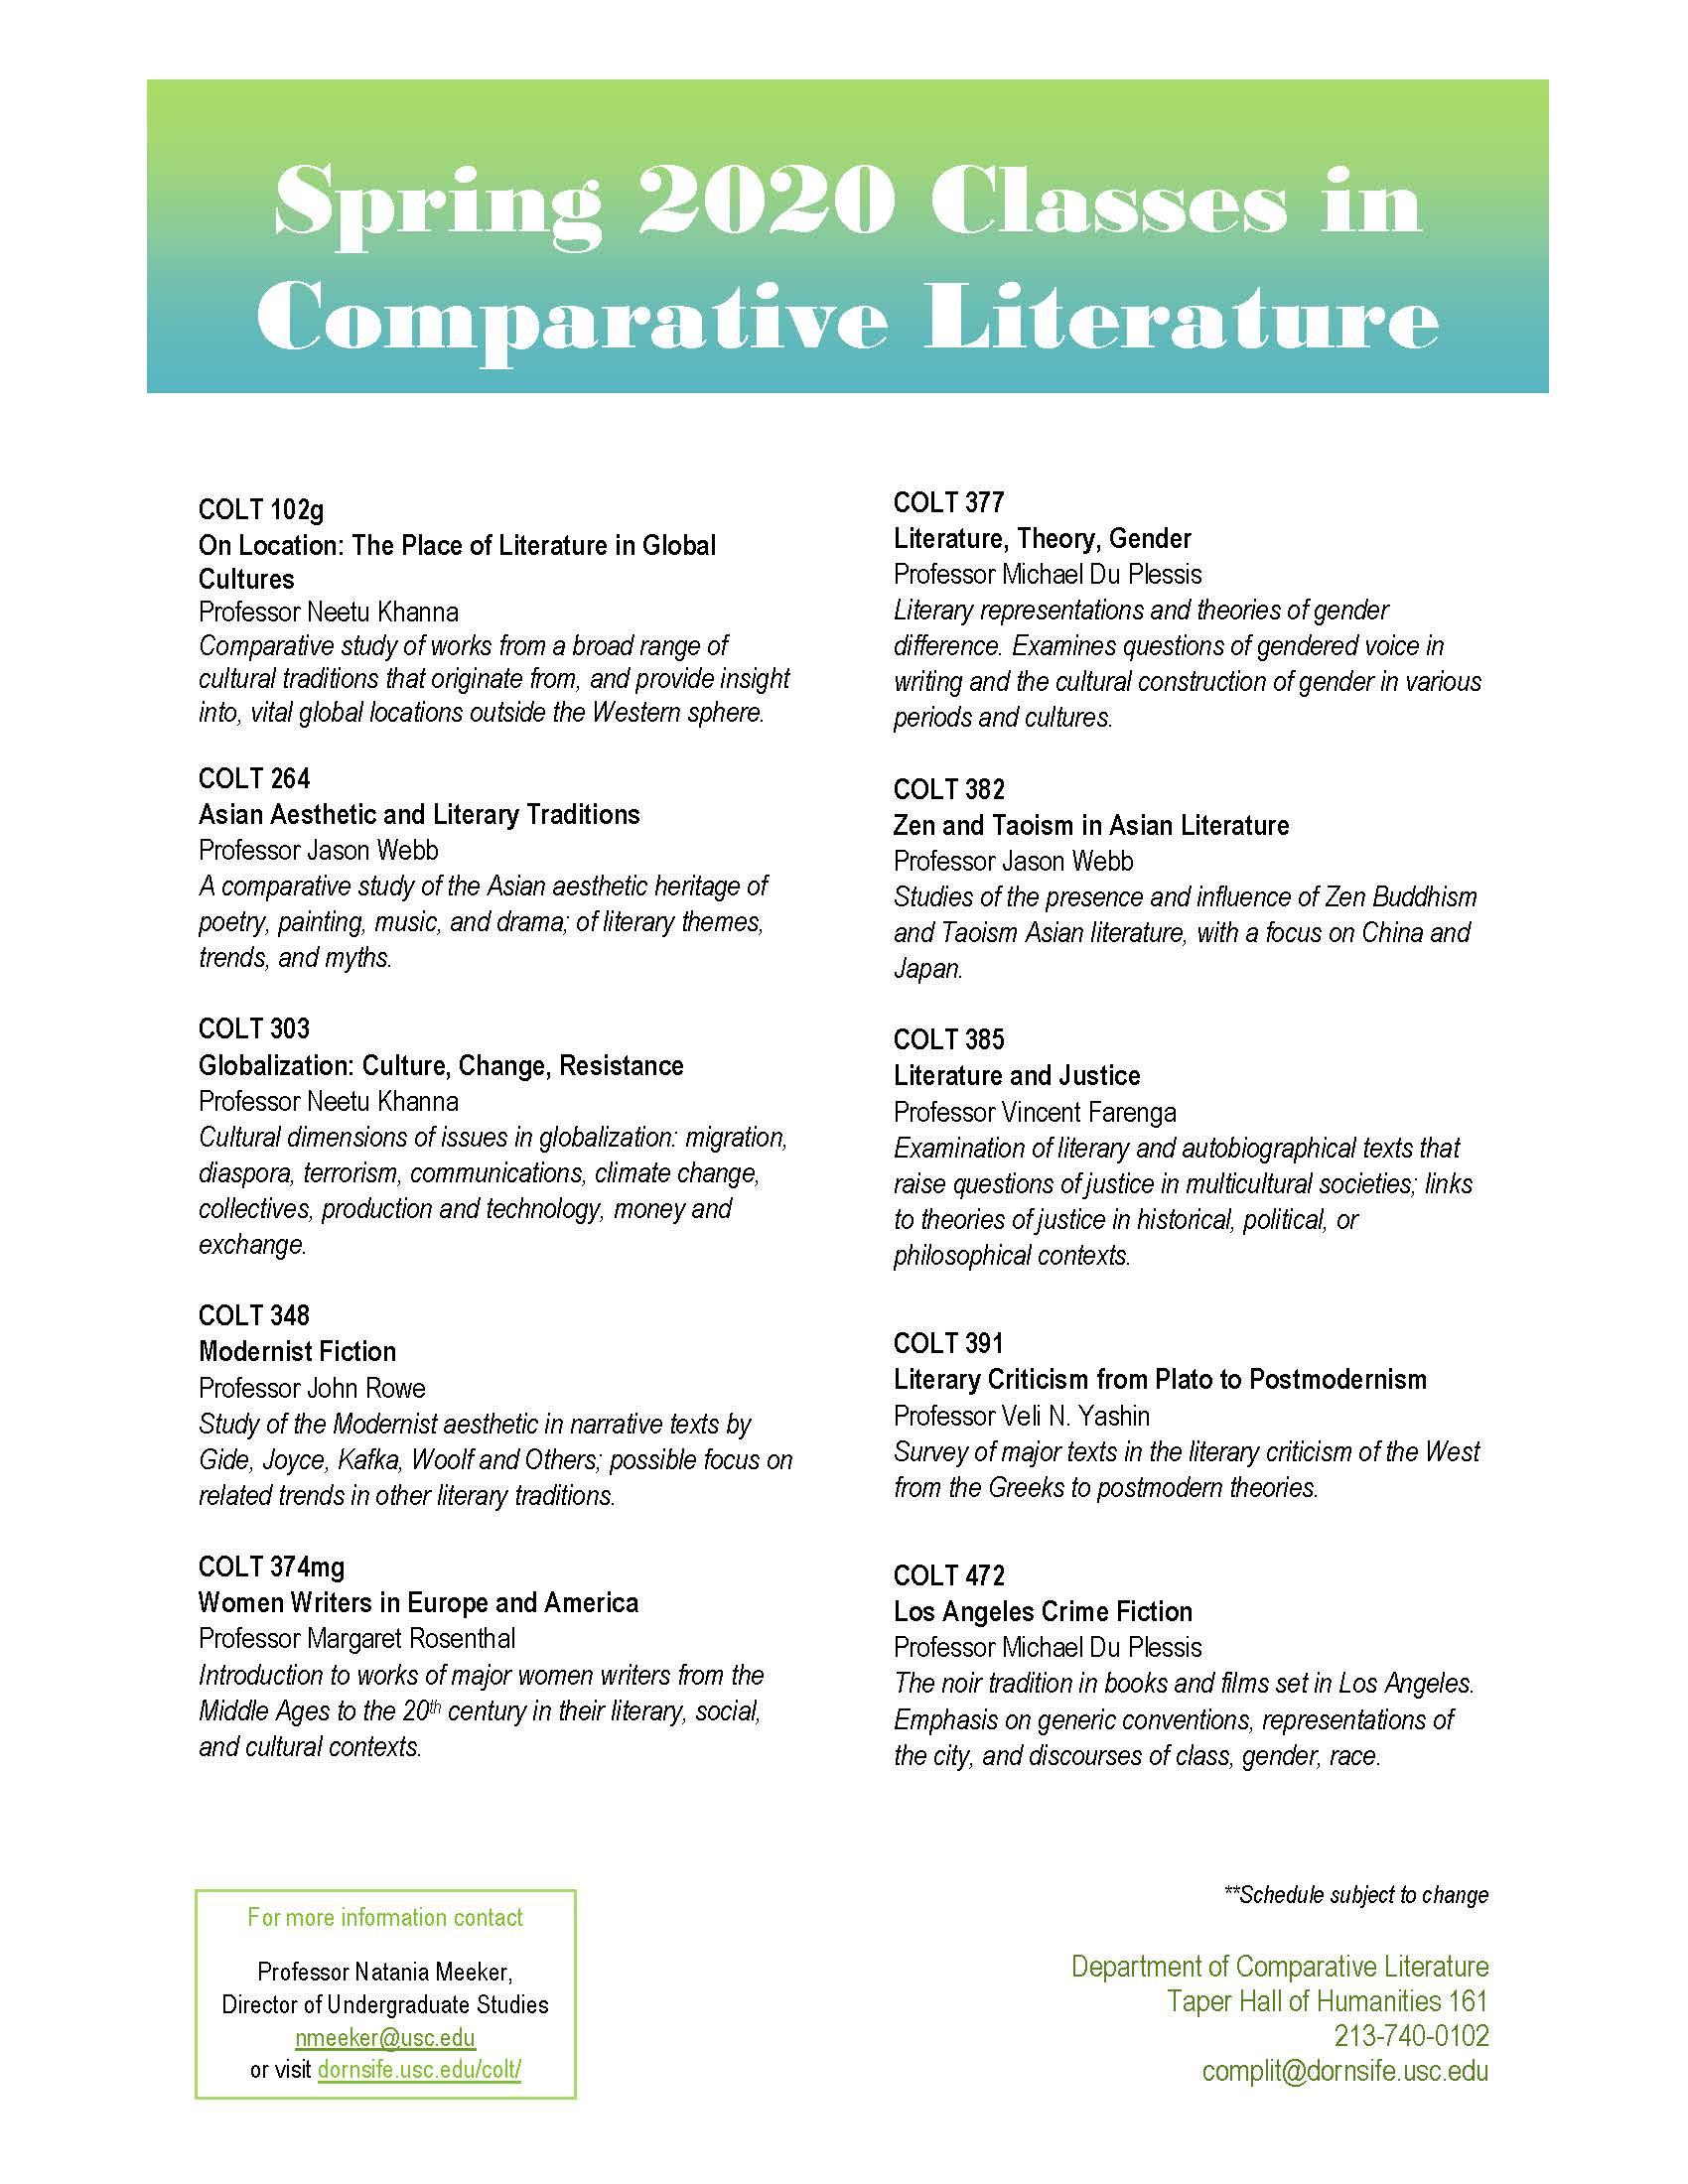 Usc Schedule Of Classes Fall 2020.Courses Department Of Comparative Literature Usc Dana